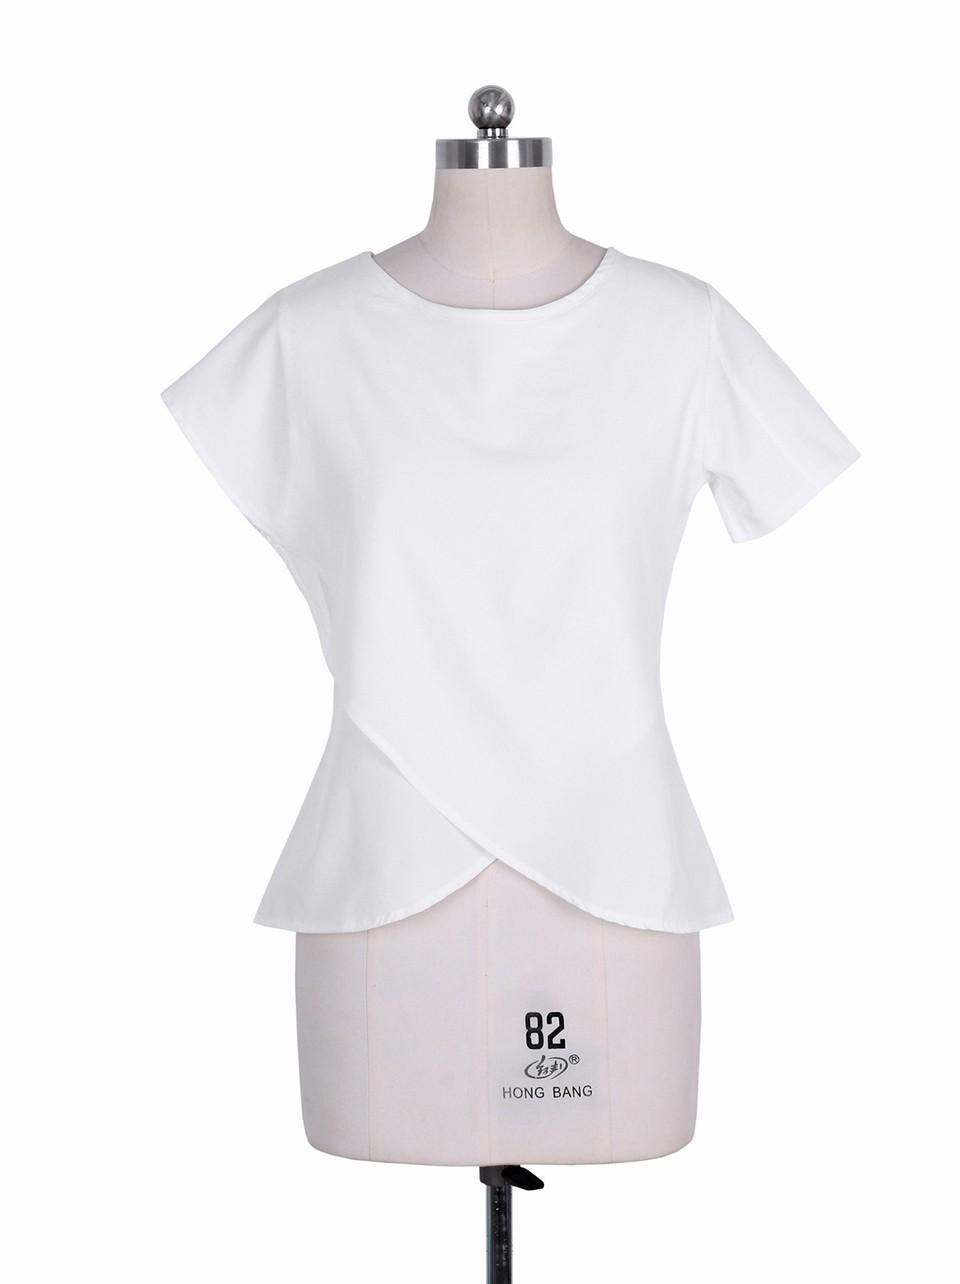 HTB12MqnNpXXXXbXXpXXq6xXFXXXG - Short Sleeve White Chiffon Blouses Womens Clothing Summer